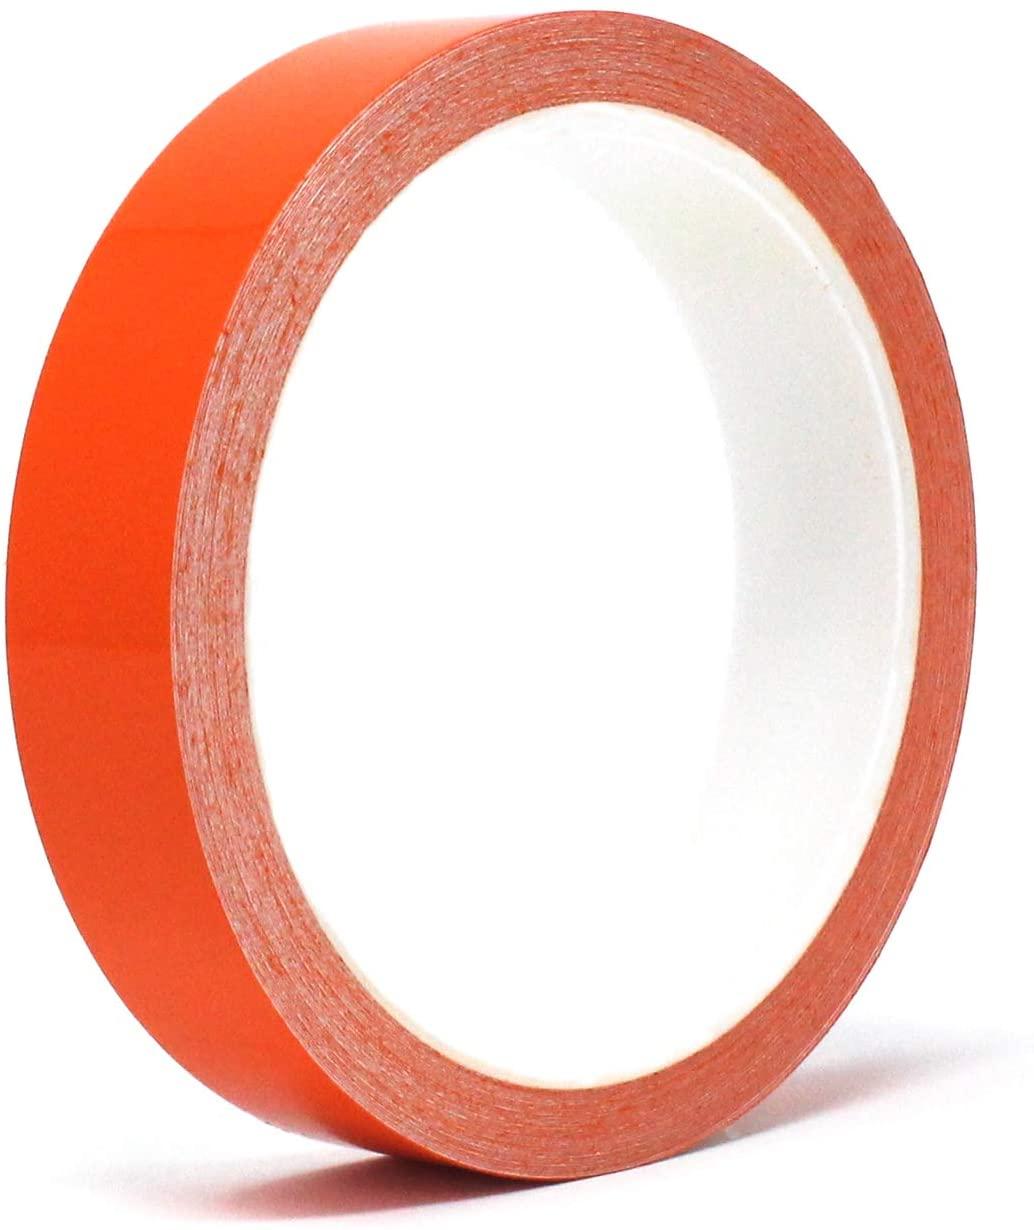 "Finest Folia Oracal Vinyl Stripe Tape 751 Pinstriping Striping Sticker 33ft Car Motorcycle Bike RC Car Truck Boat Decal (Orange Glossy, 0,590"")"